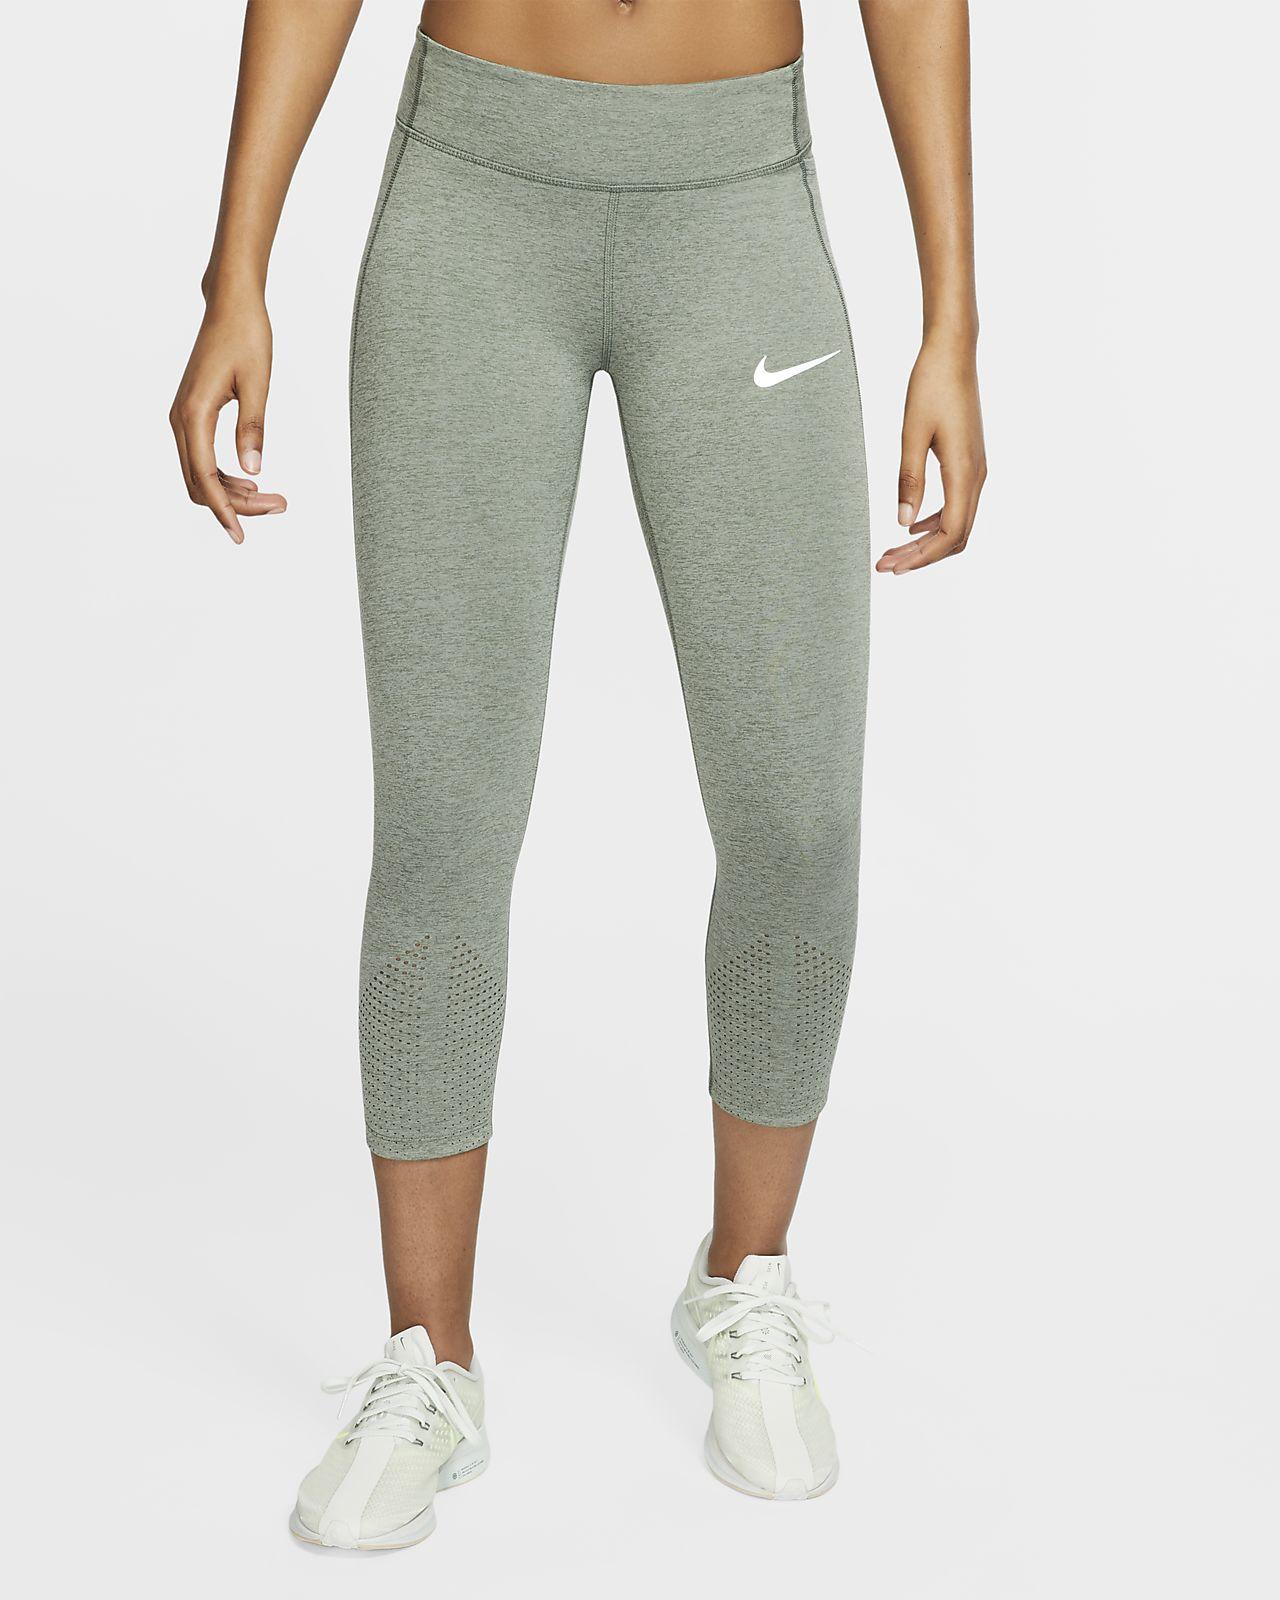 Nike Epic Lux W Vêtements running femme et fitness Collants